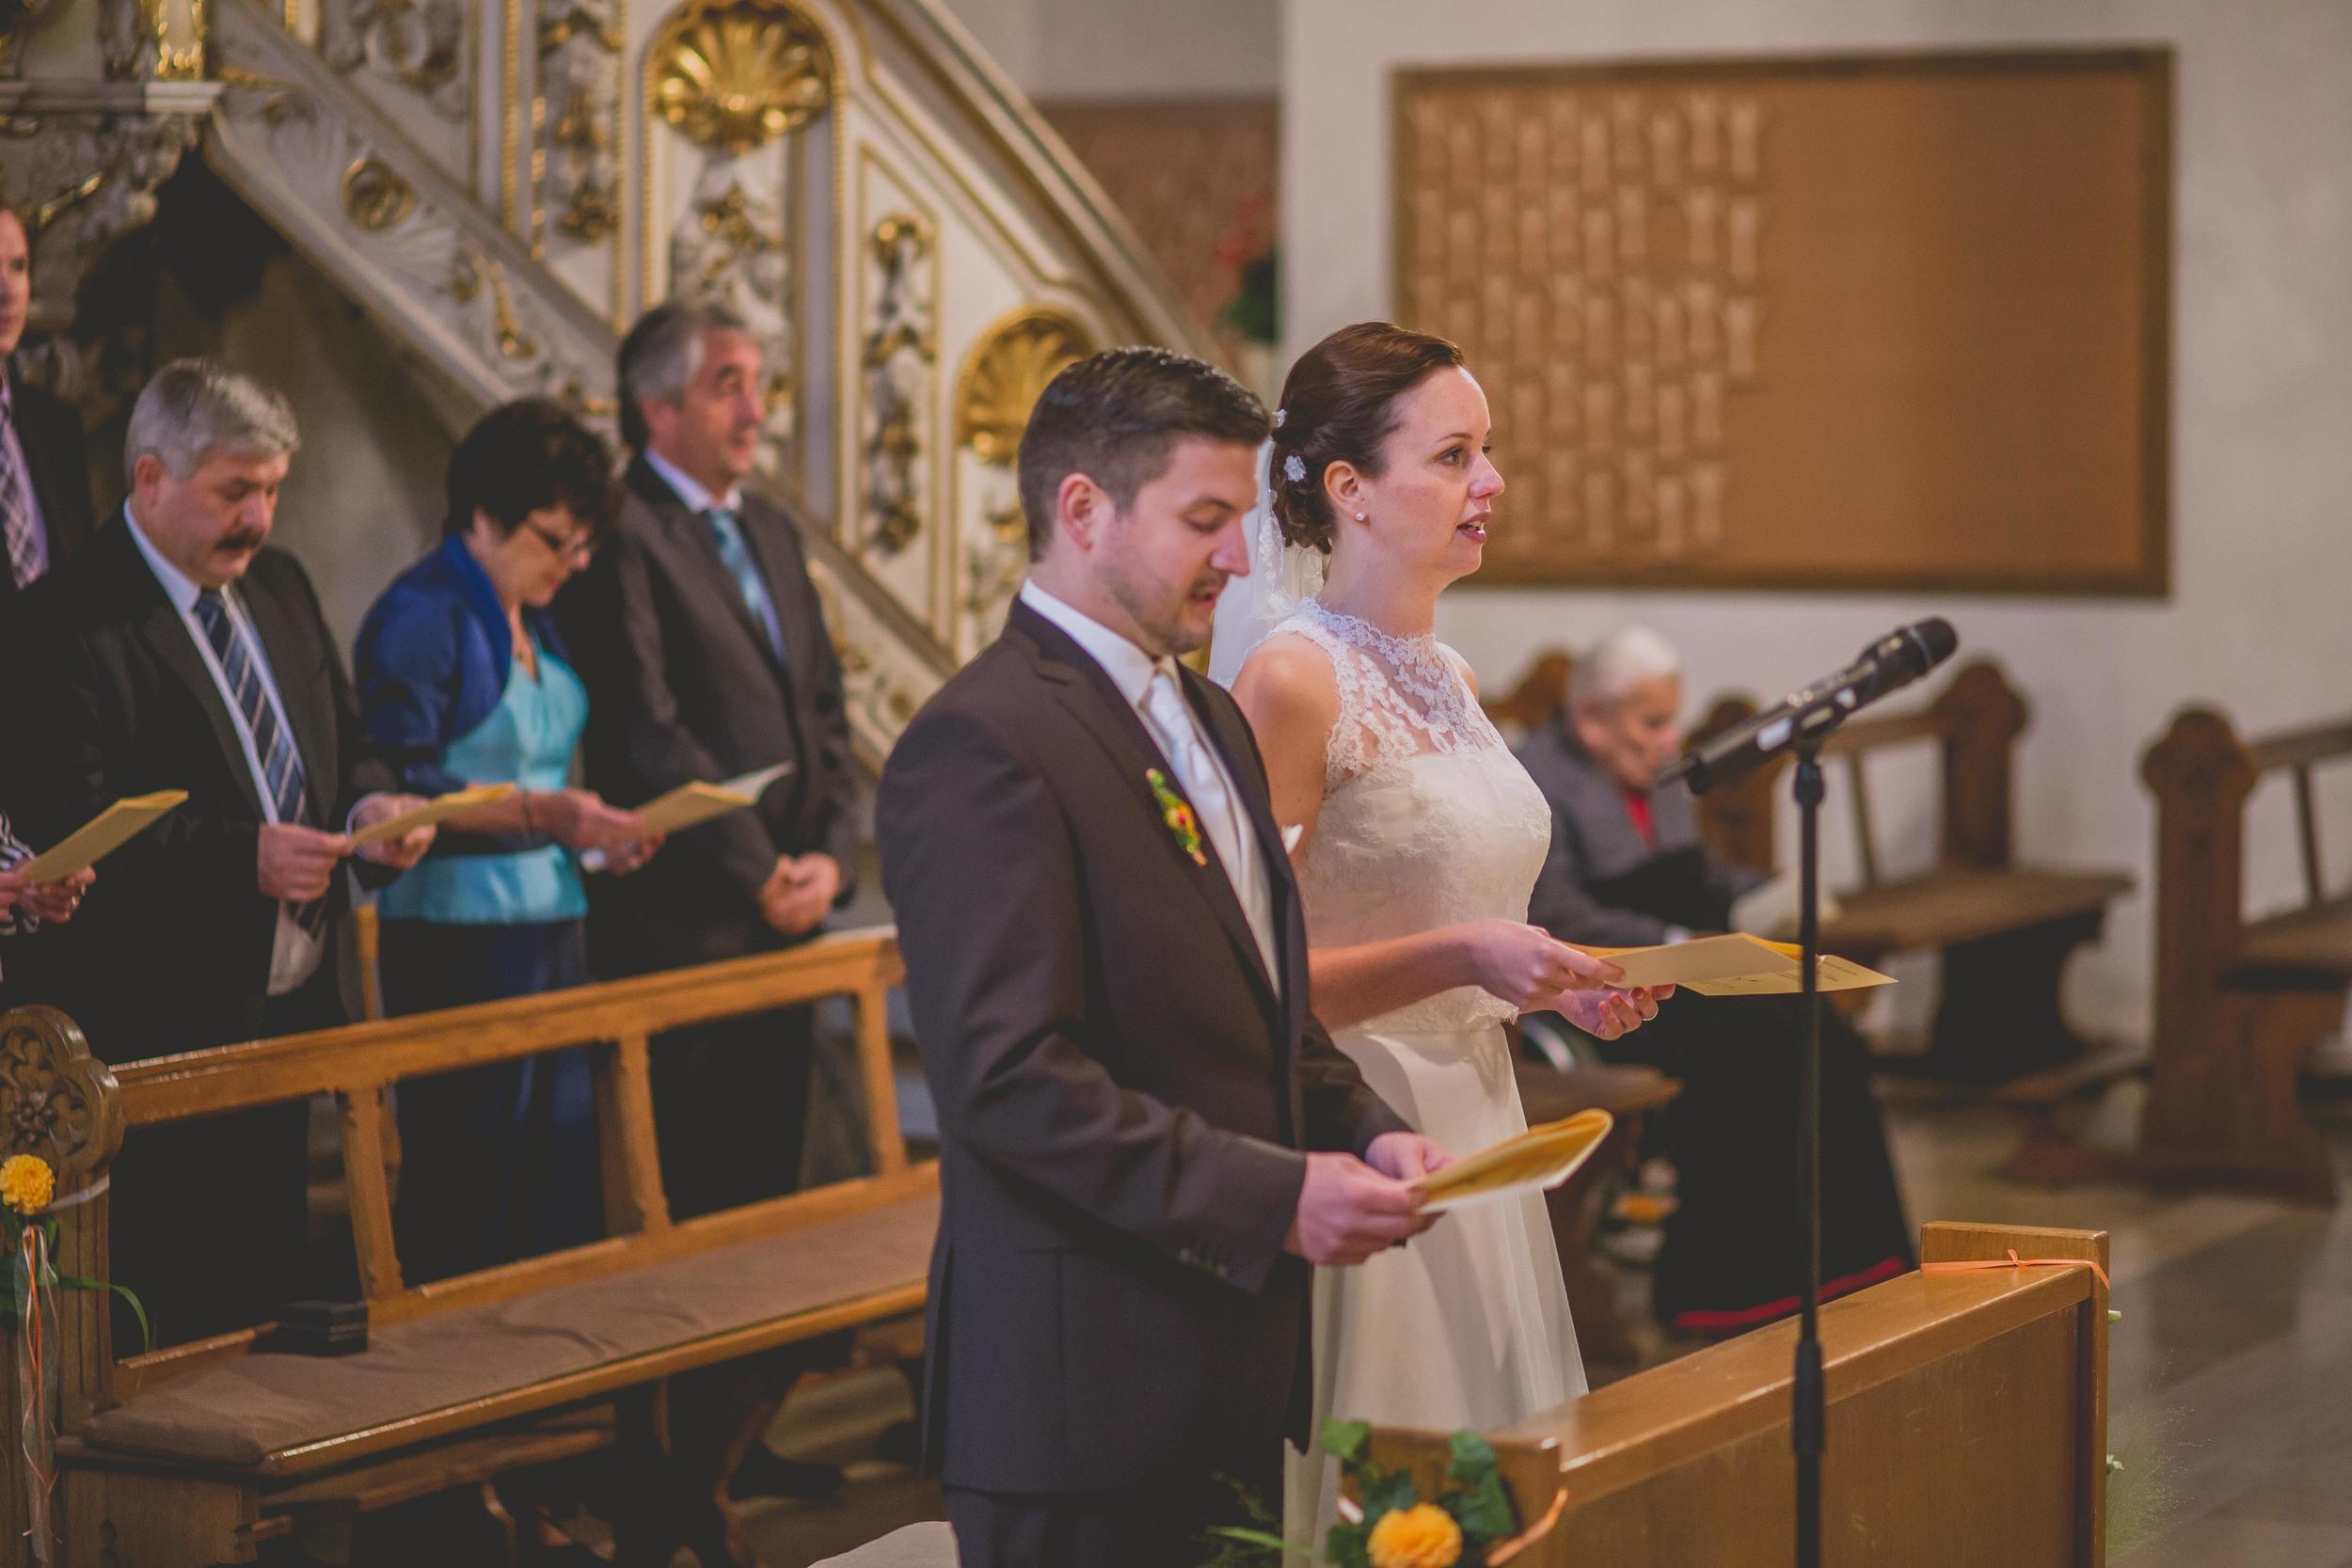 Buffalo-Wedding-Photography-by-Stefan-Ludwig10252014WEB-34.jpg